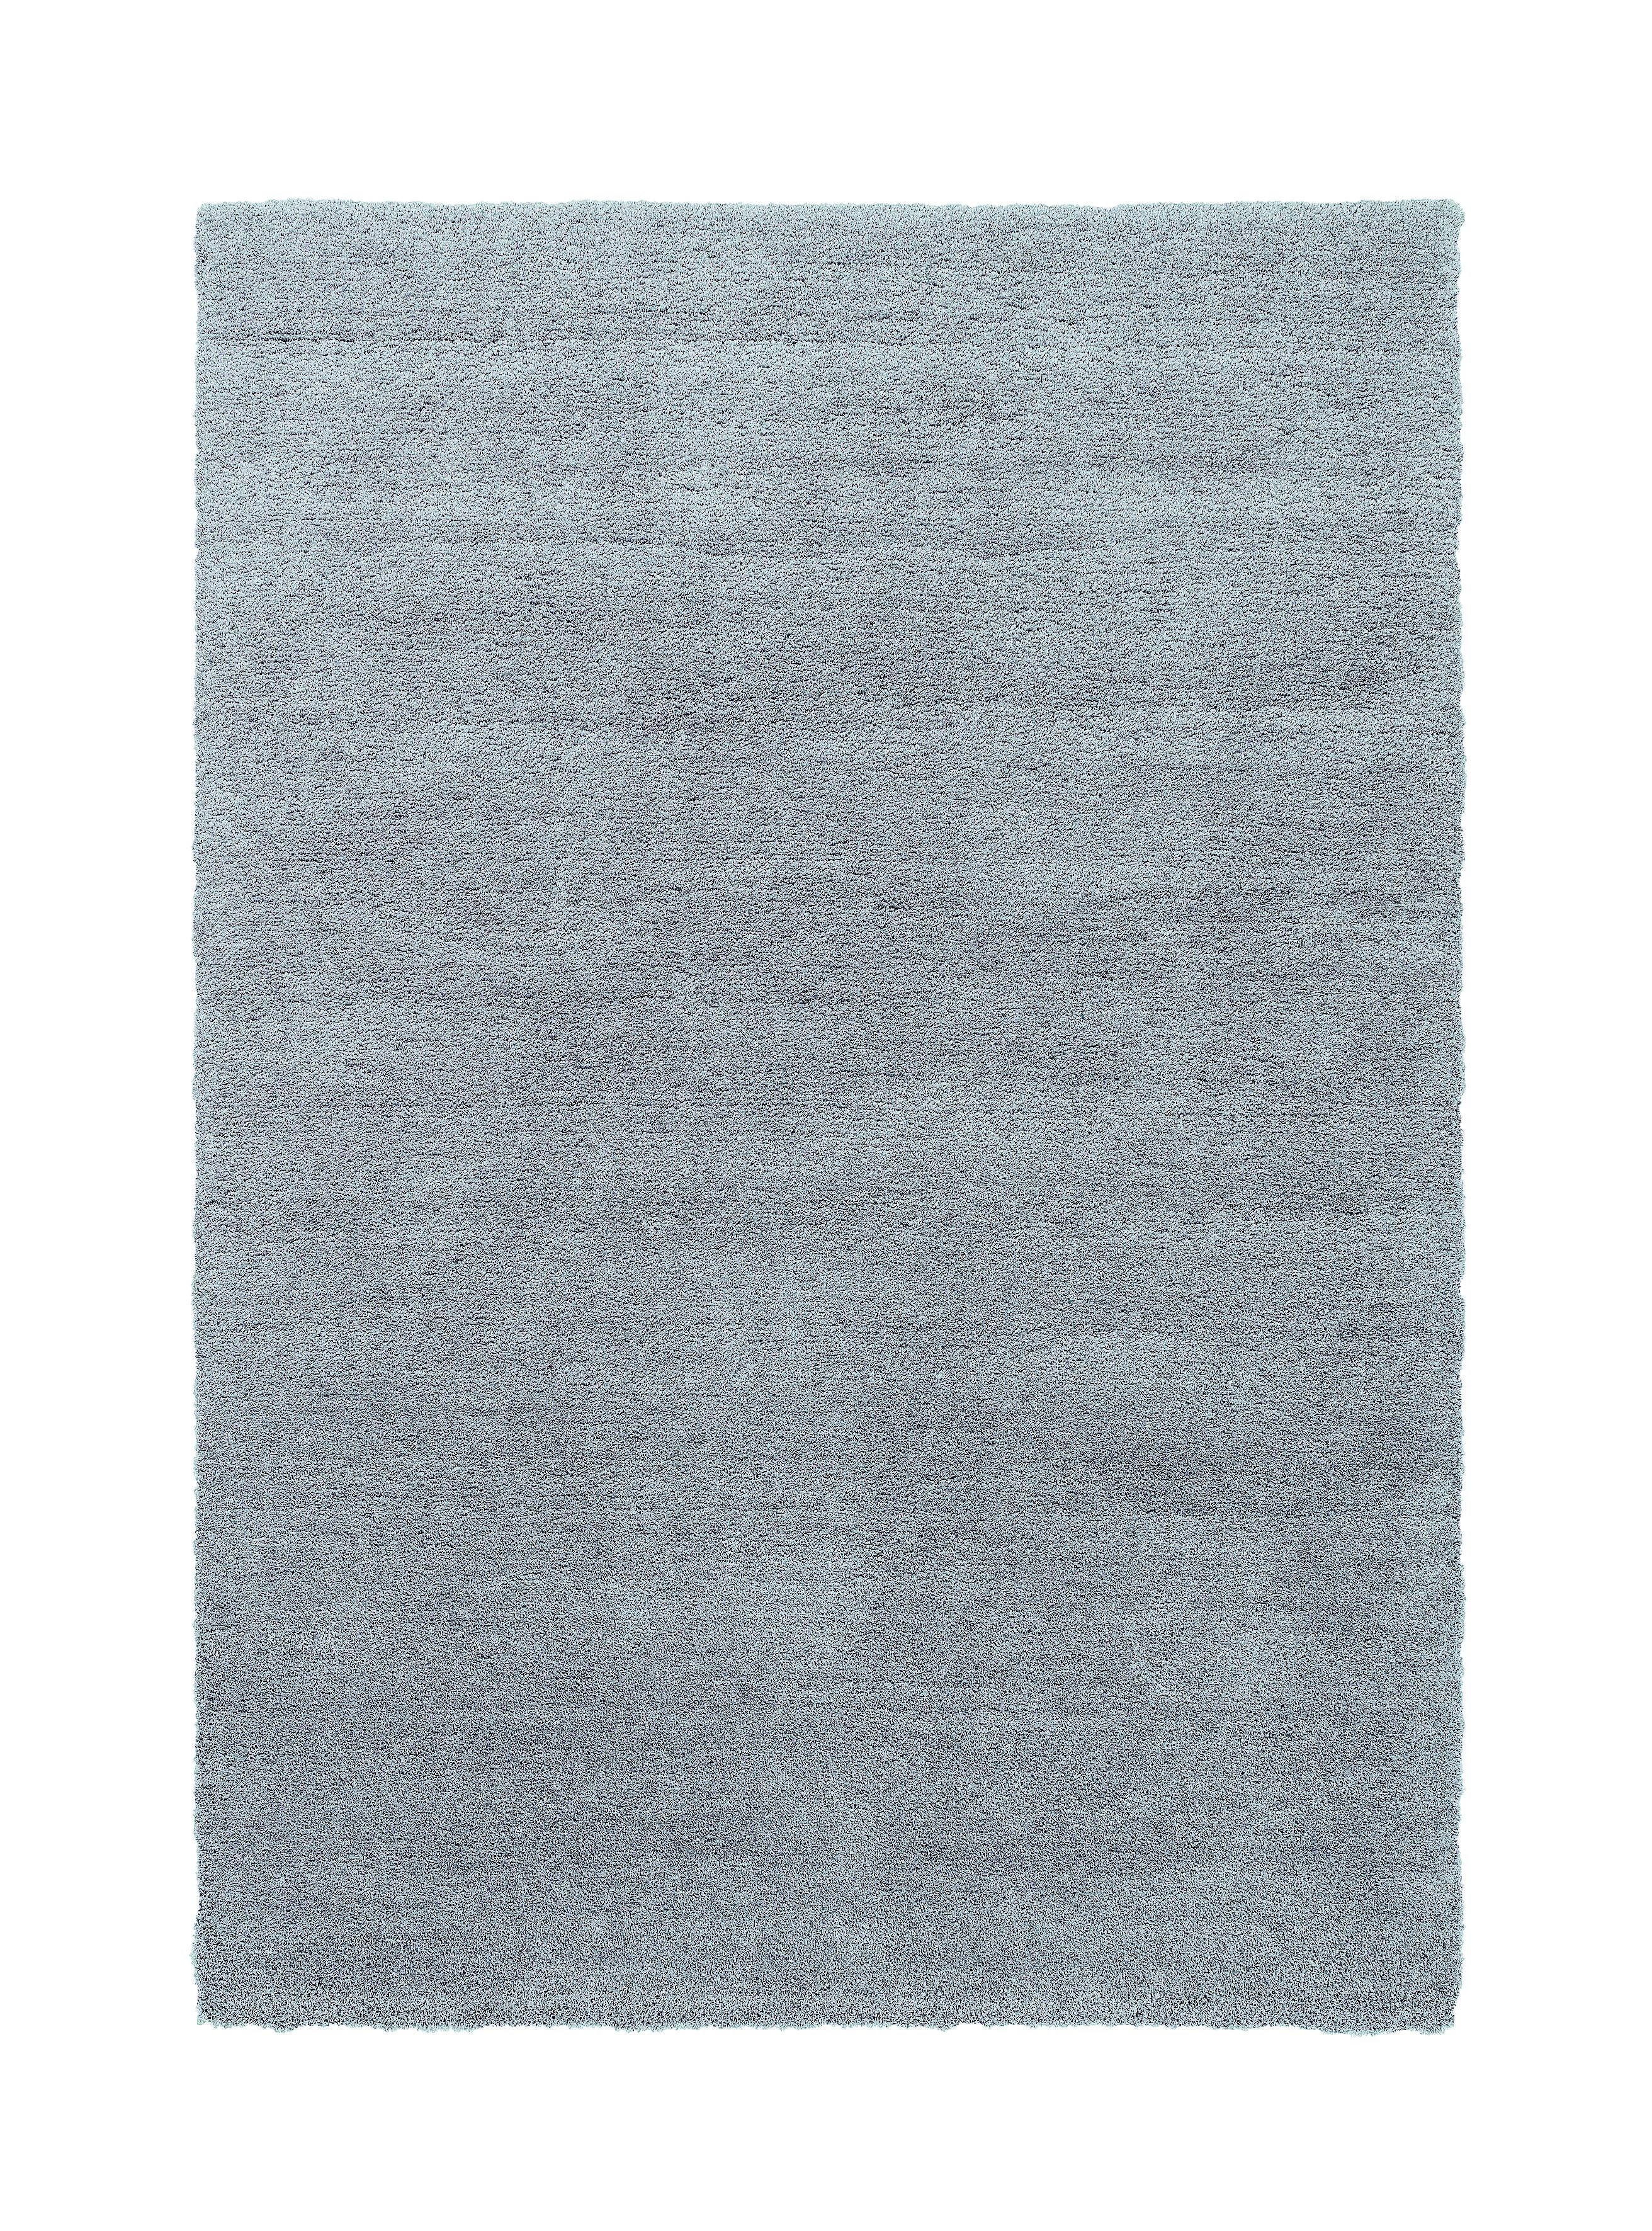 Astra - Golze koberce Kusový koberec Livorno 004 Silver - 140x200 cm